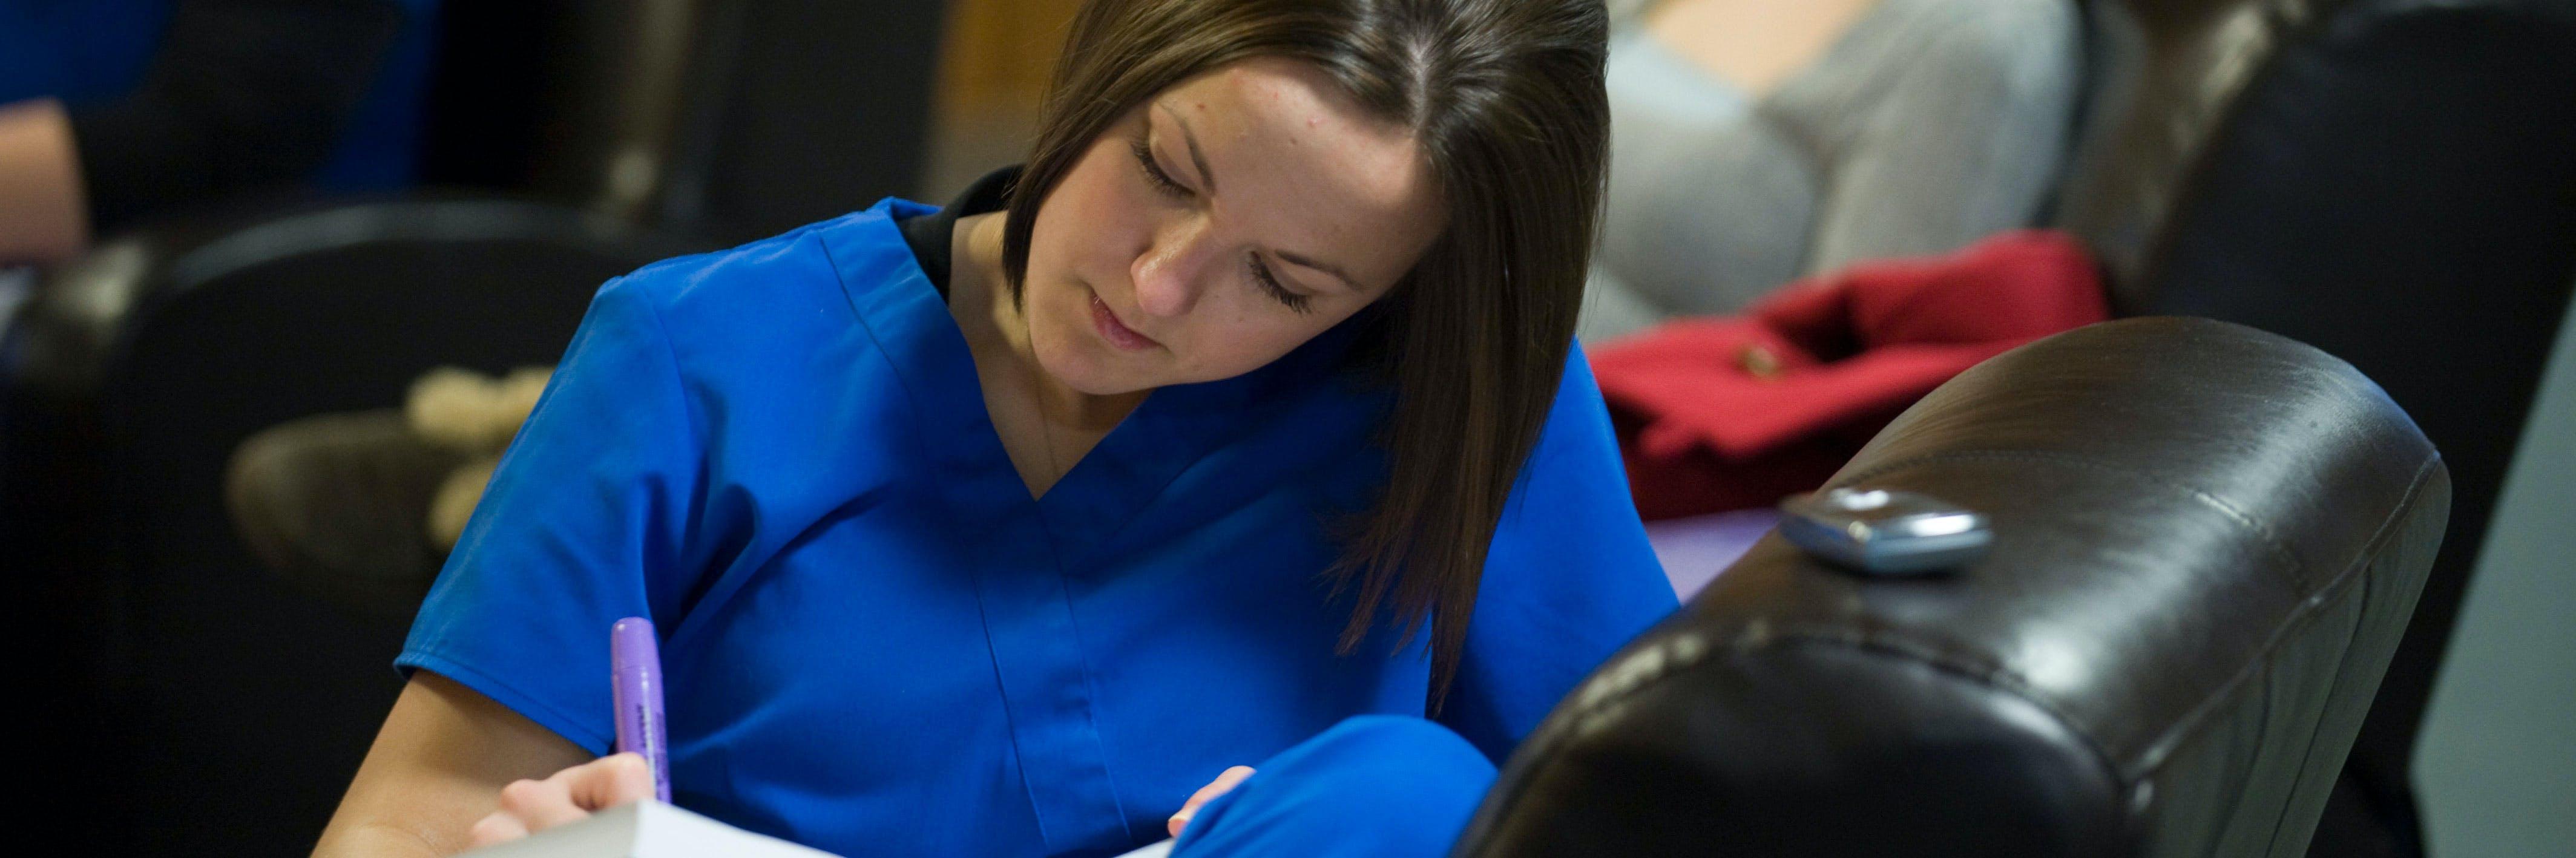 Bethel University's Post-Baccalaureate Nursing program is designed for adult students looking to make a career change to nursing.